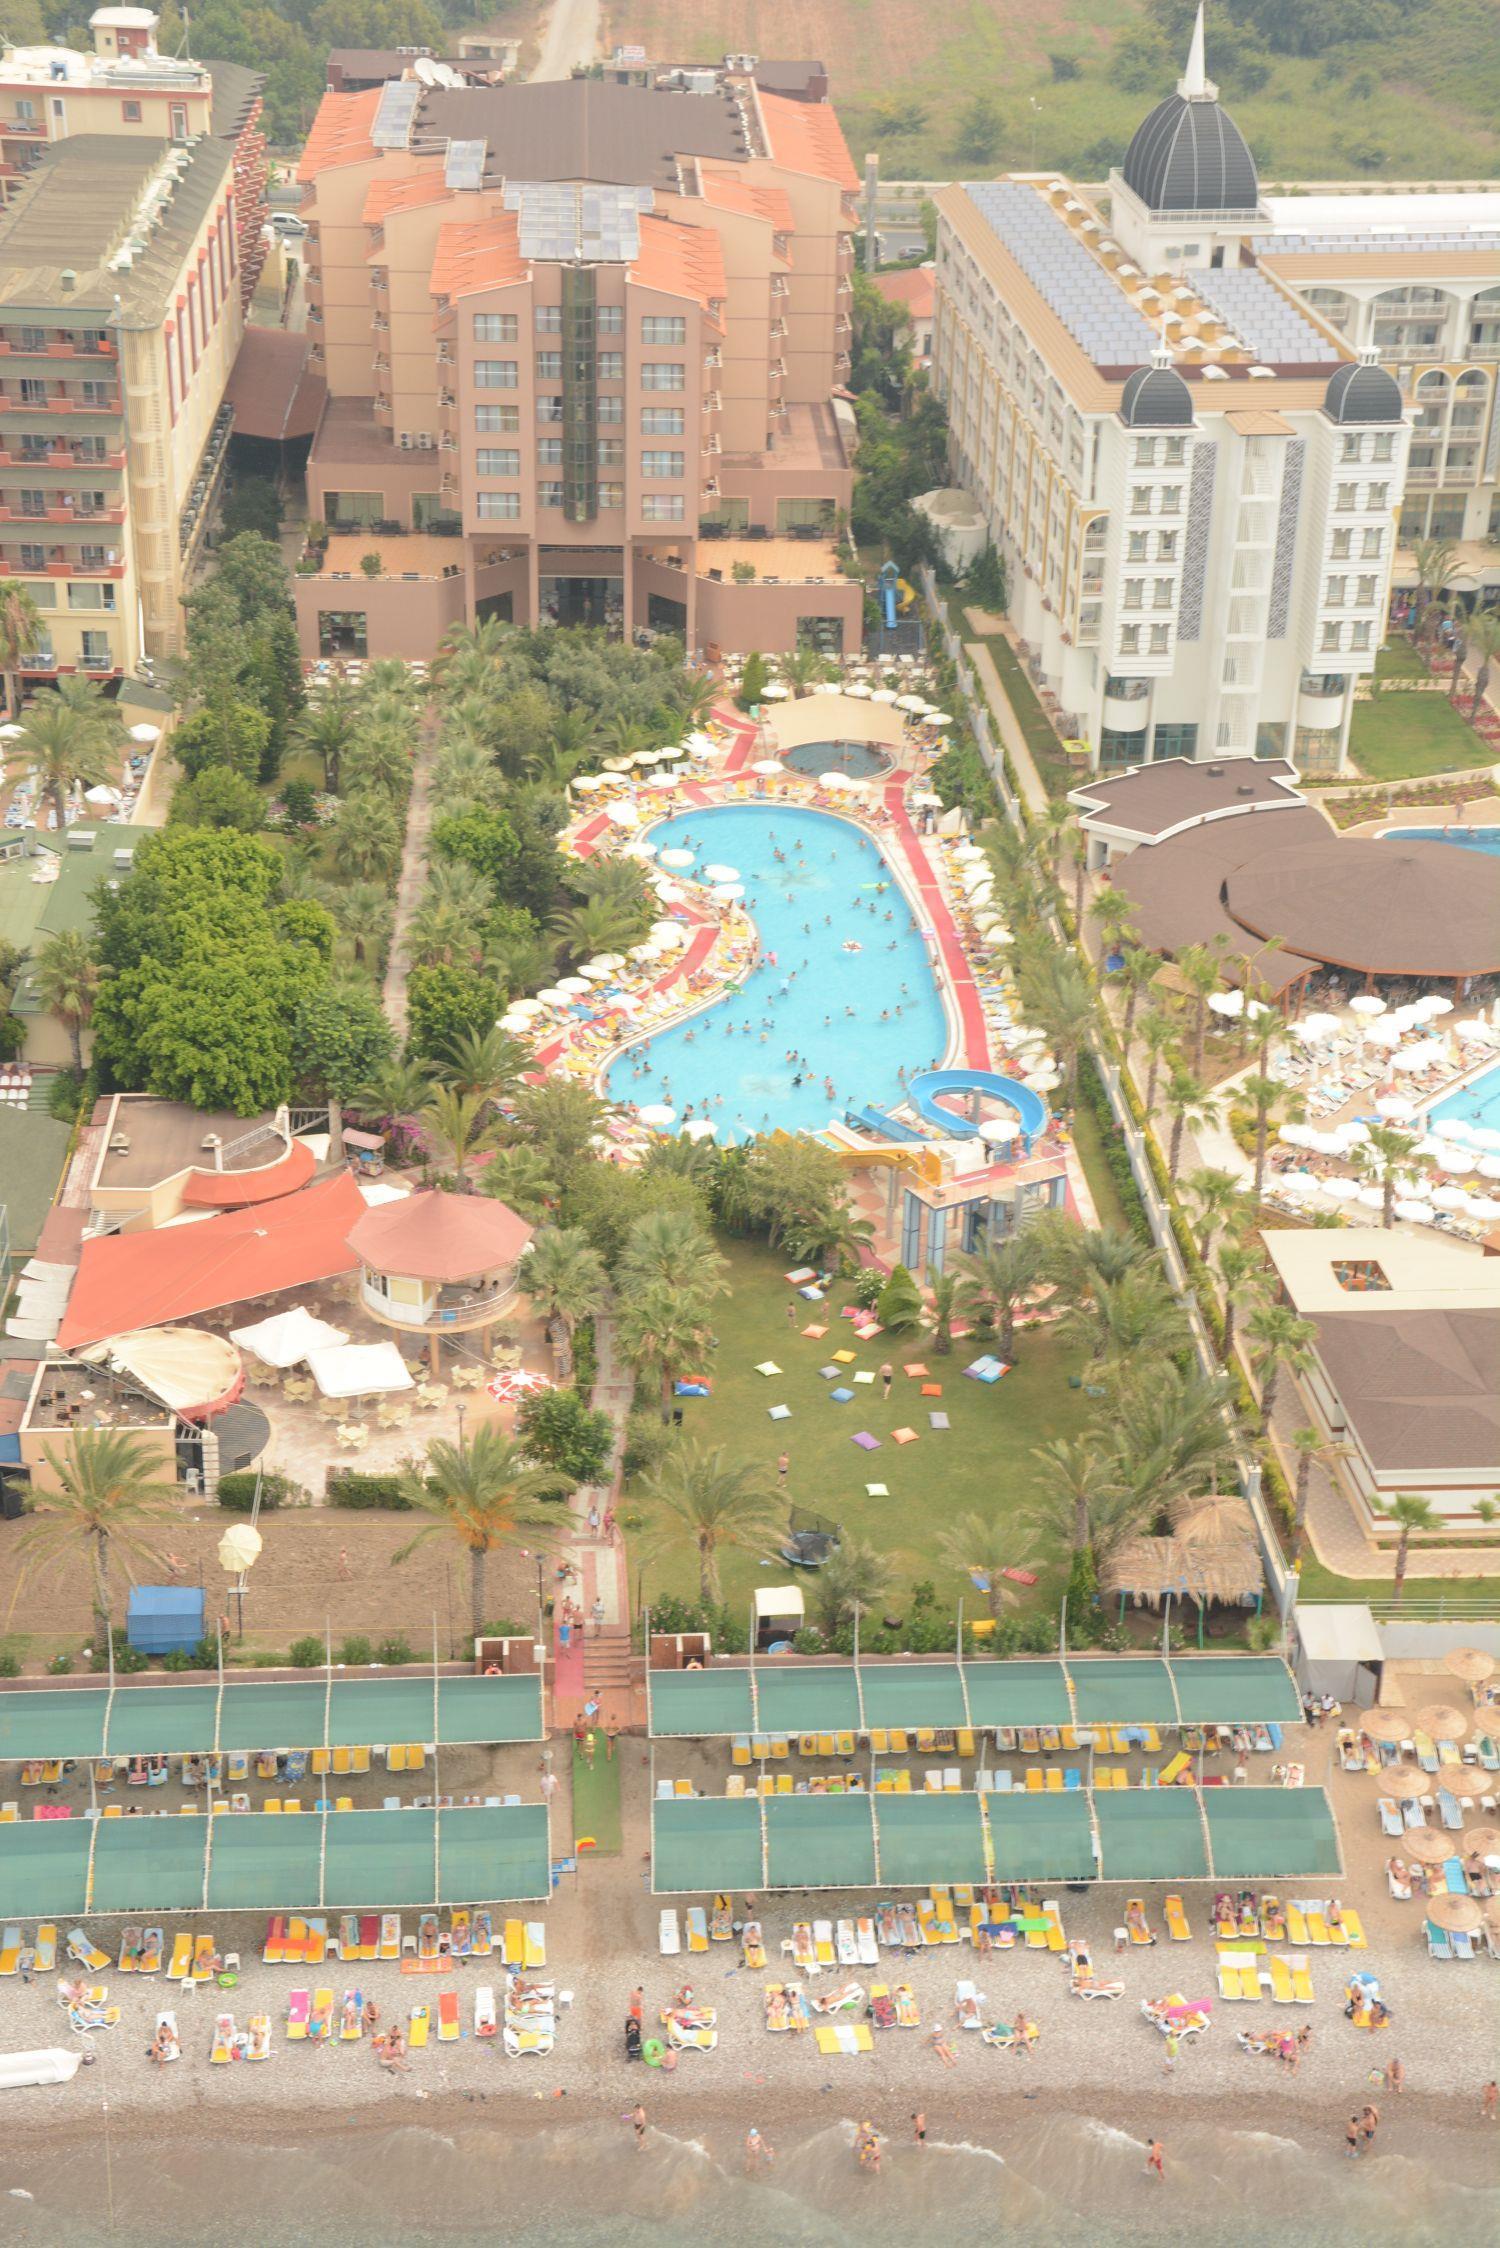 http://www.orextravel.sk/OREX/hotelphotos/stella-beach-hotel-alanya-general-0015.jpg